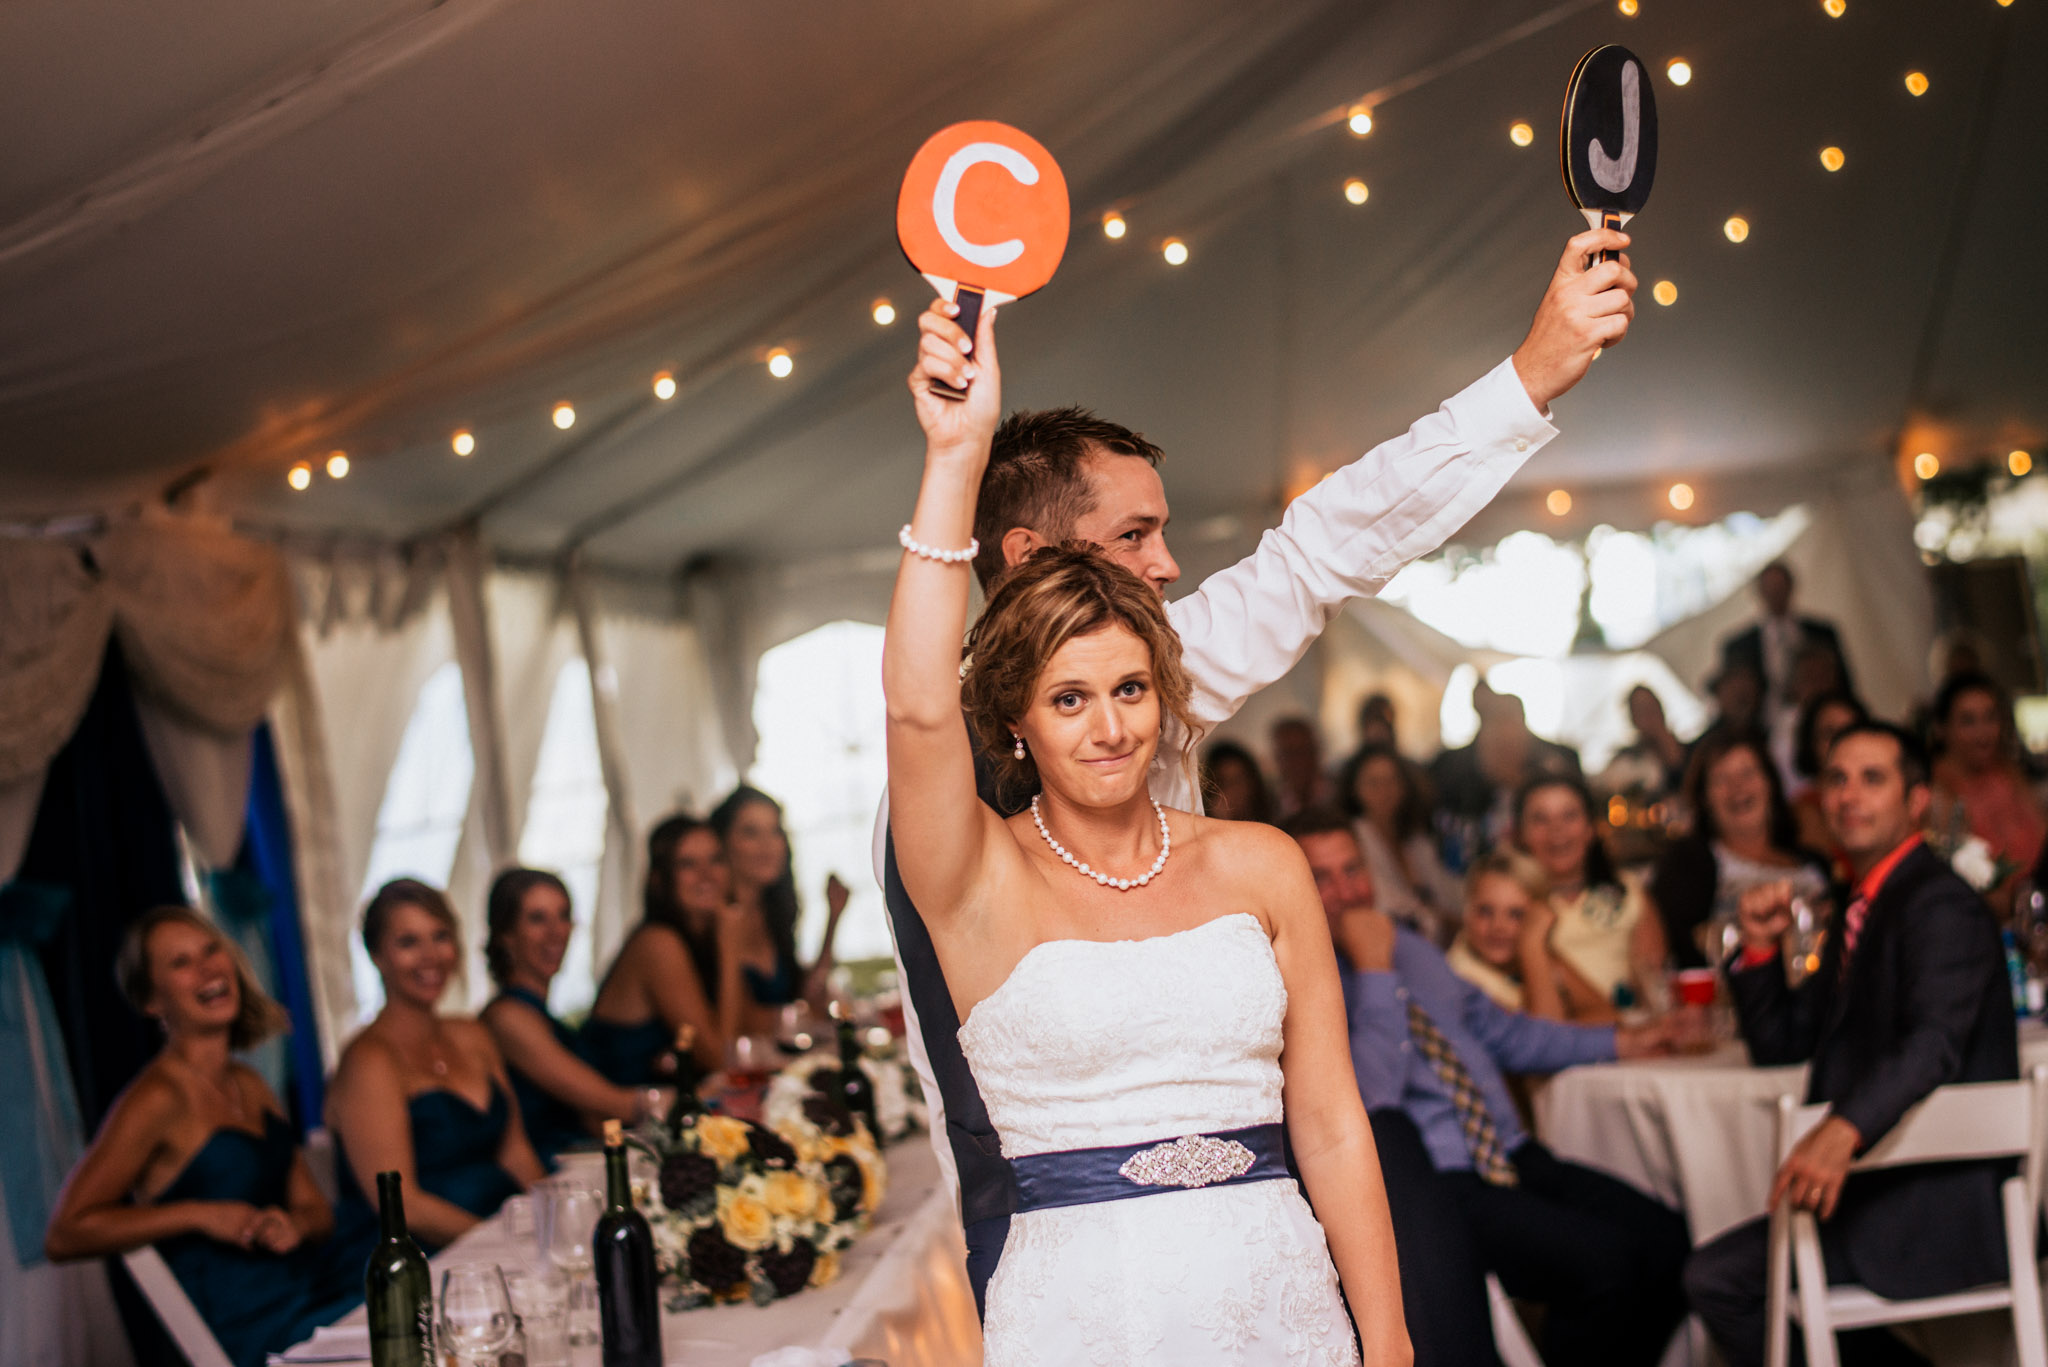 Grand-Bend-Tent-Wedding-wedding-shoe-game-001.jpg